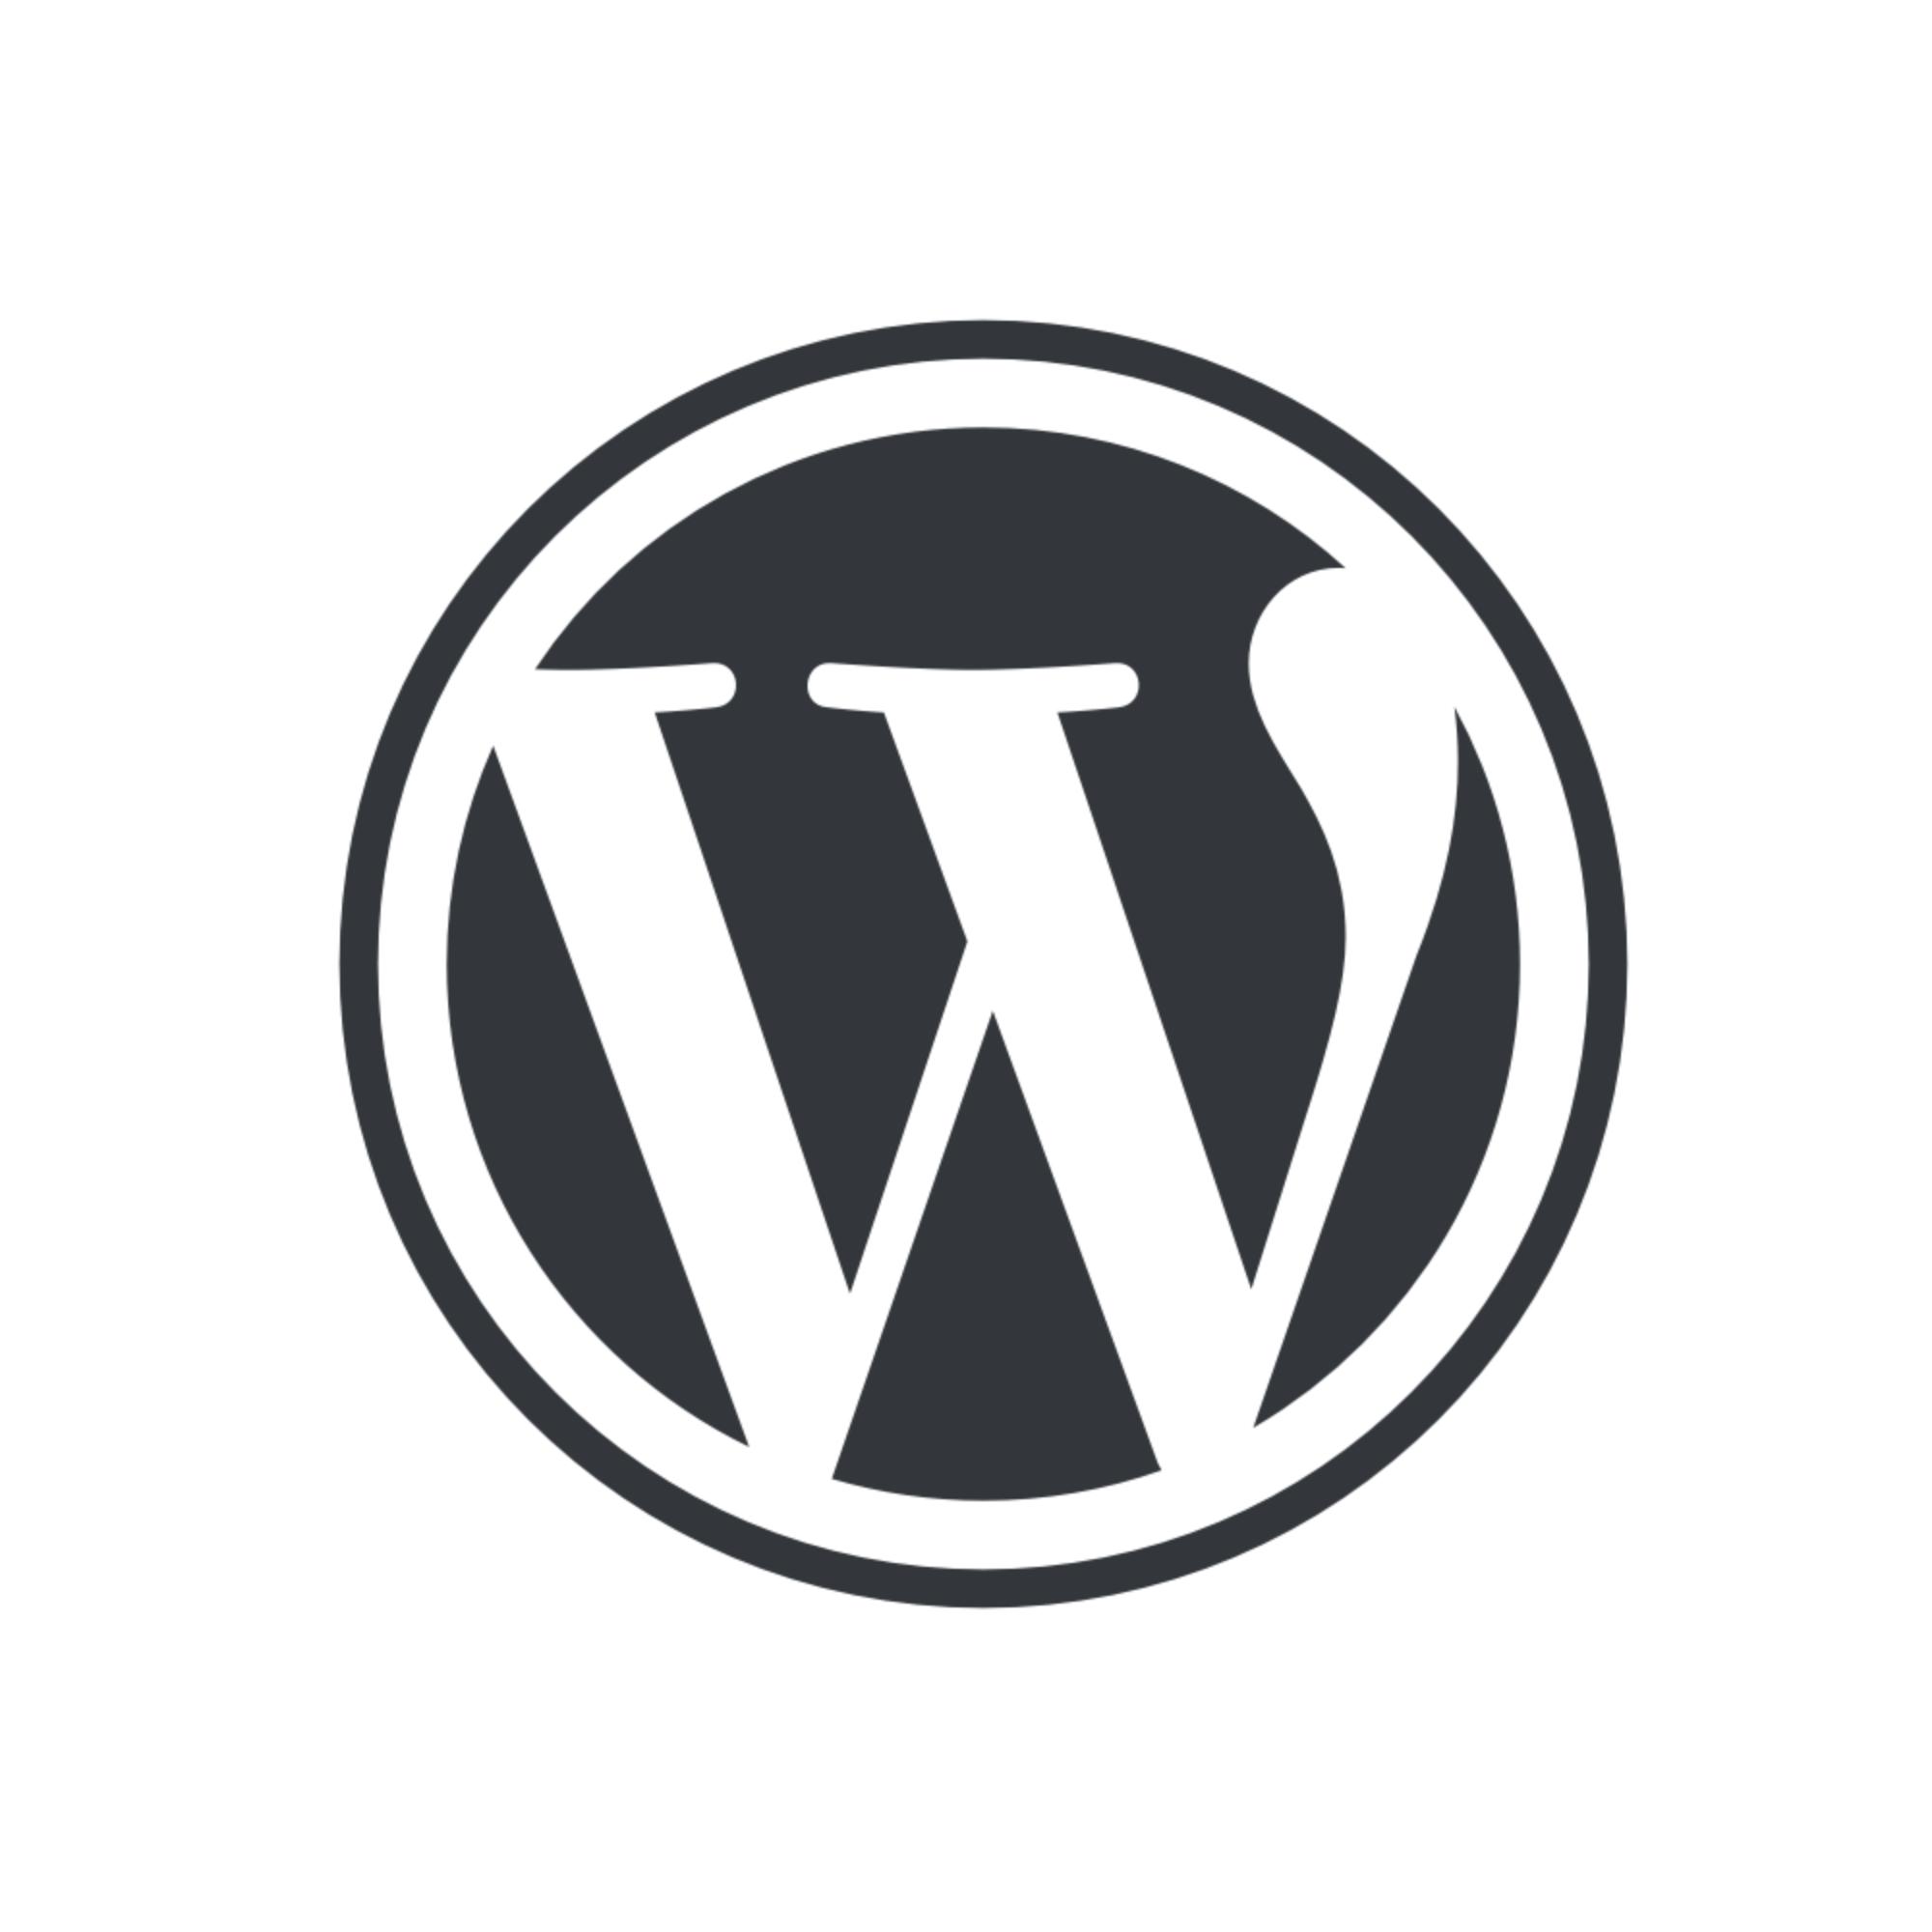 wordpressでログインしているときとログインしていないときで表示する内容を変える